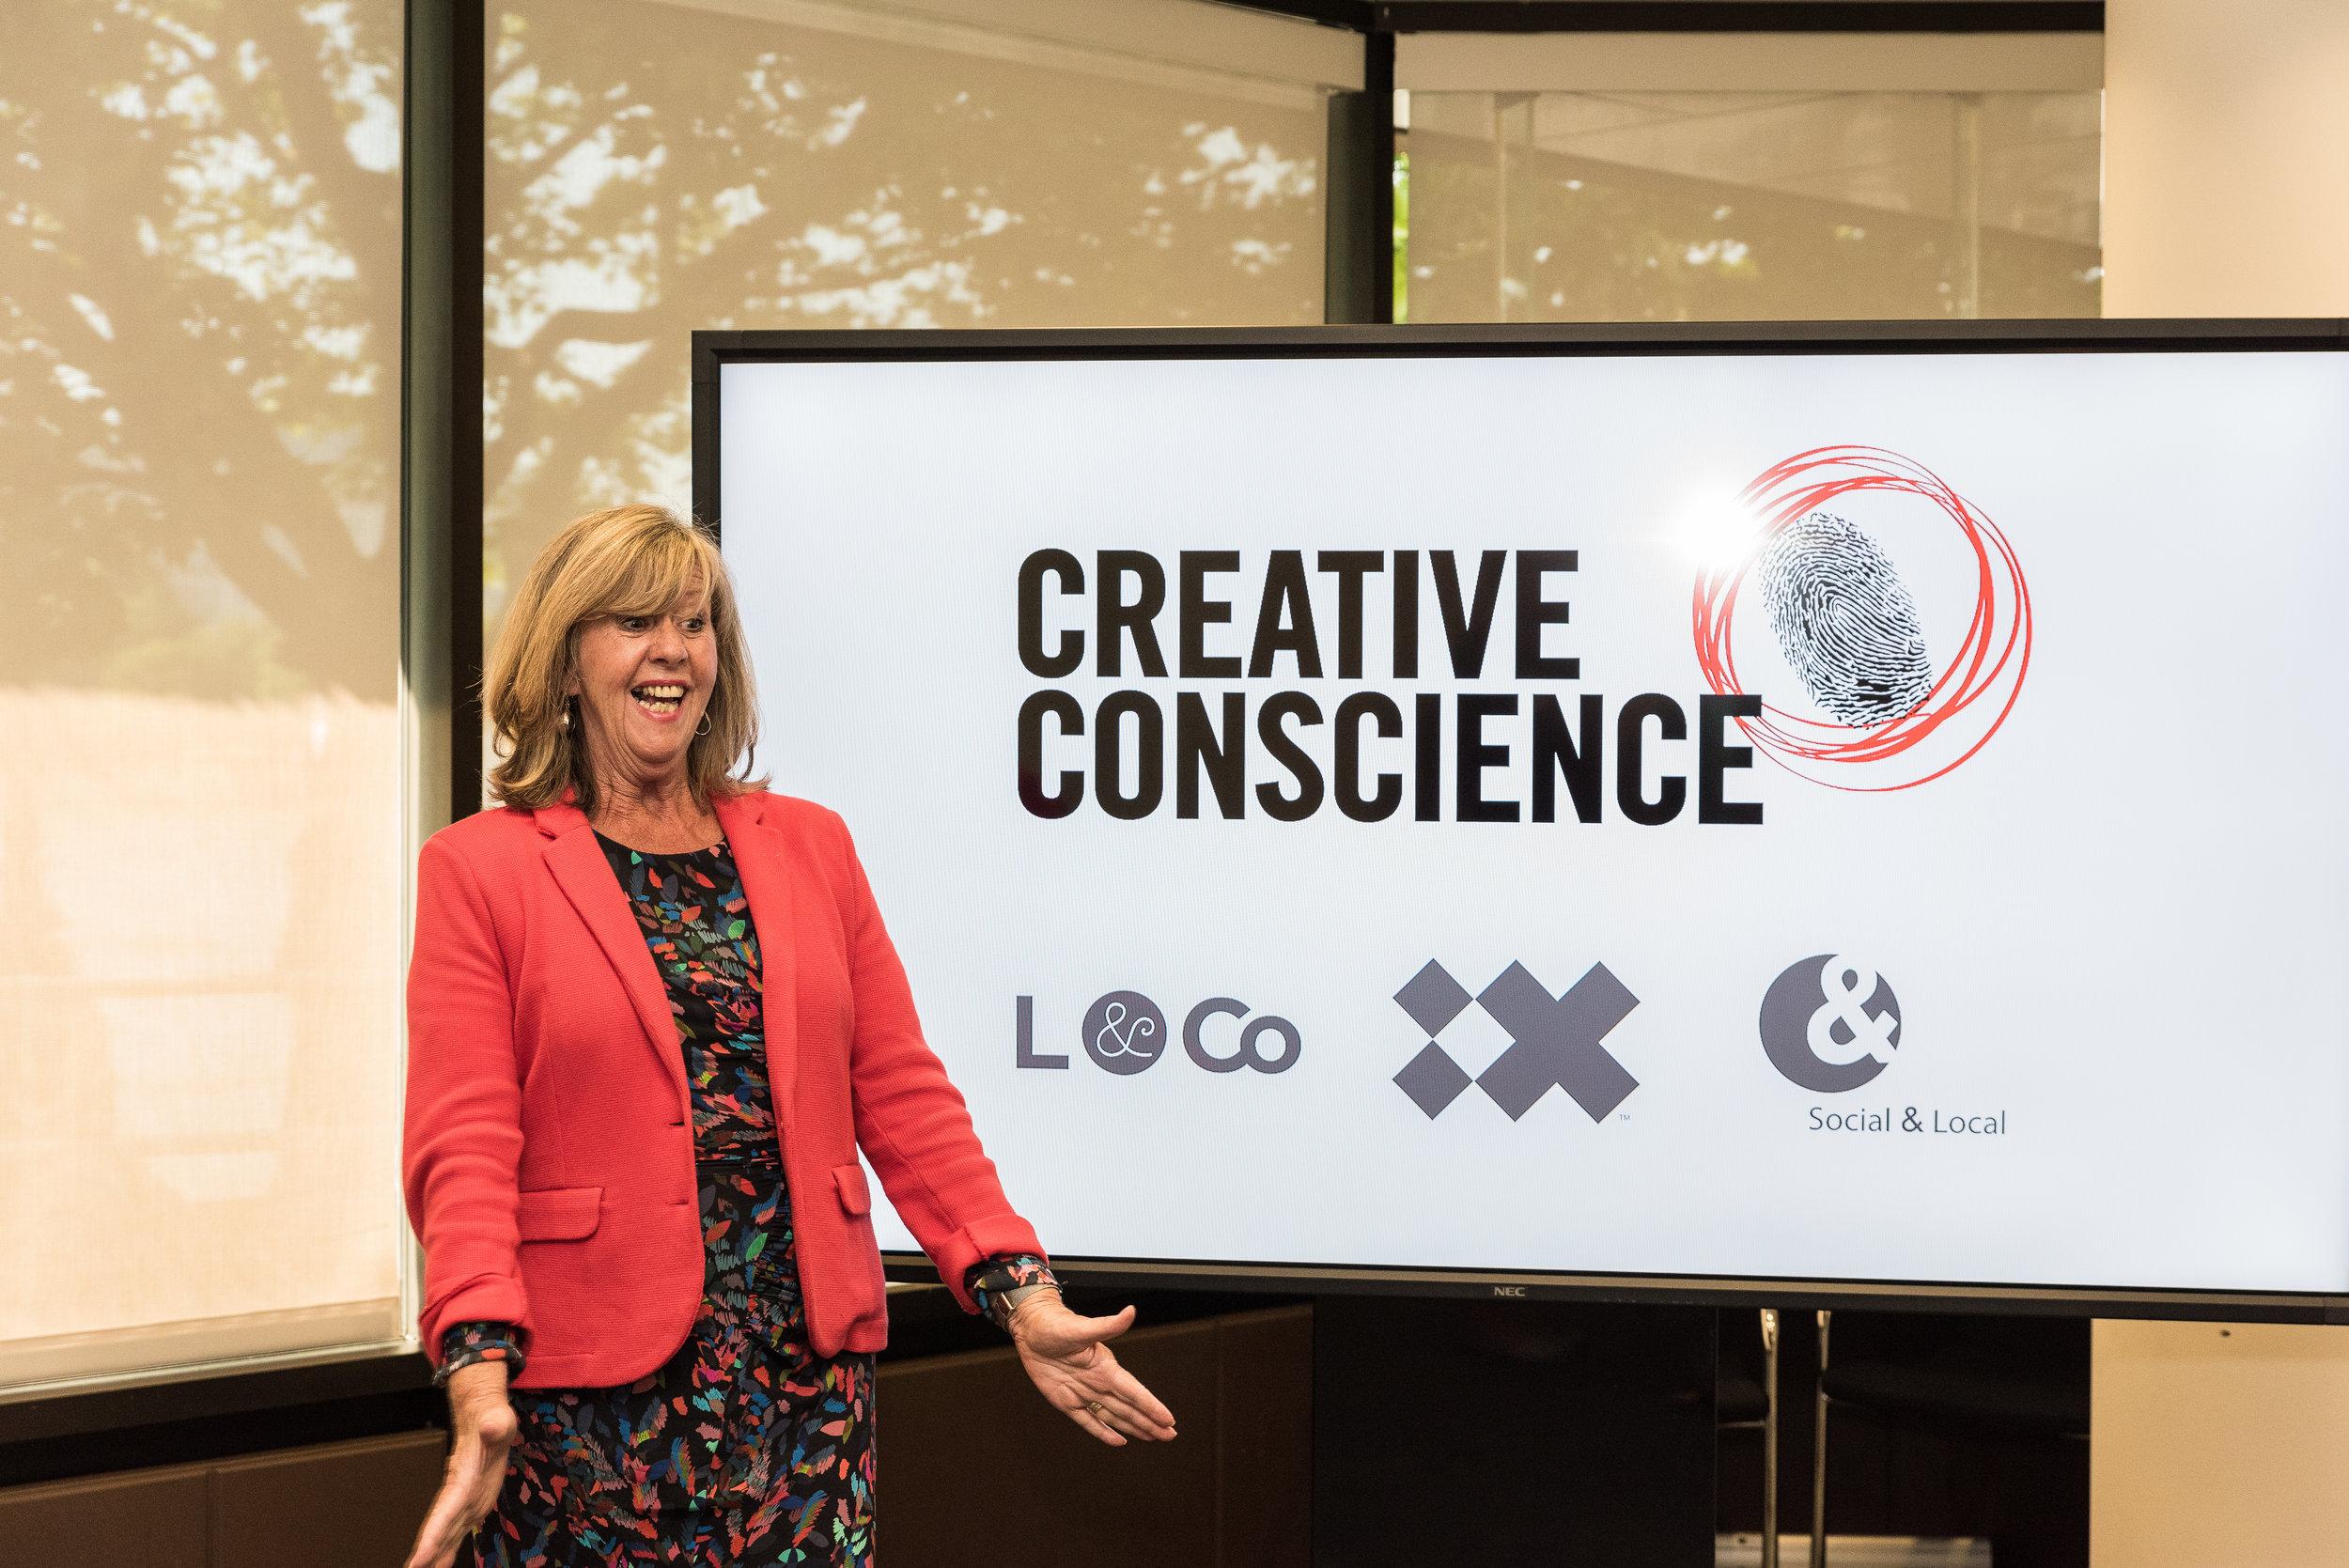 Creative Conscience Awards 2018 Photography Tunbridge Studio Portrait Photographer 030718-51.jpg